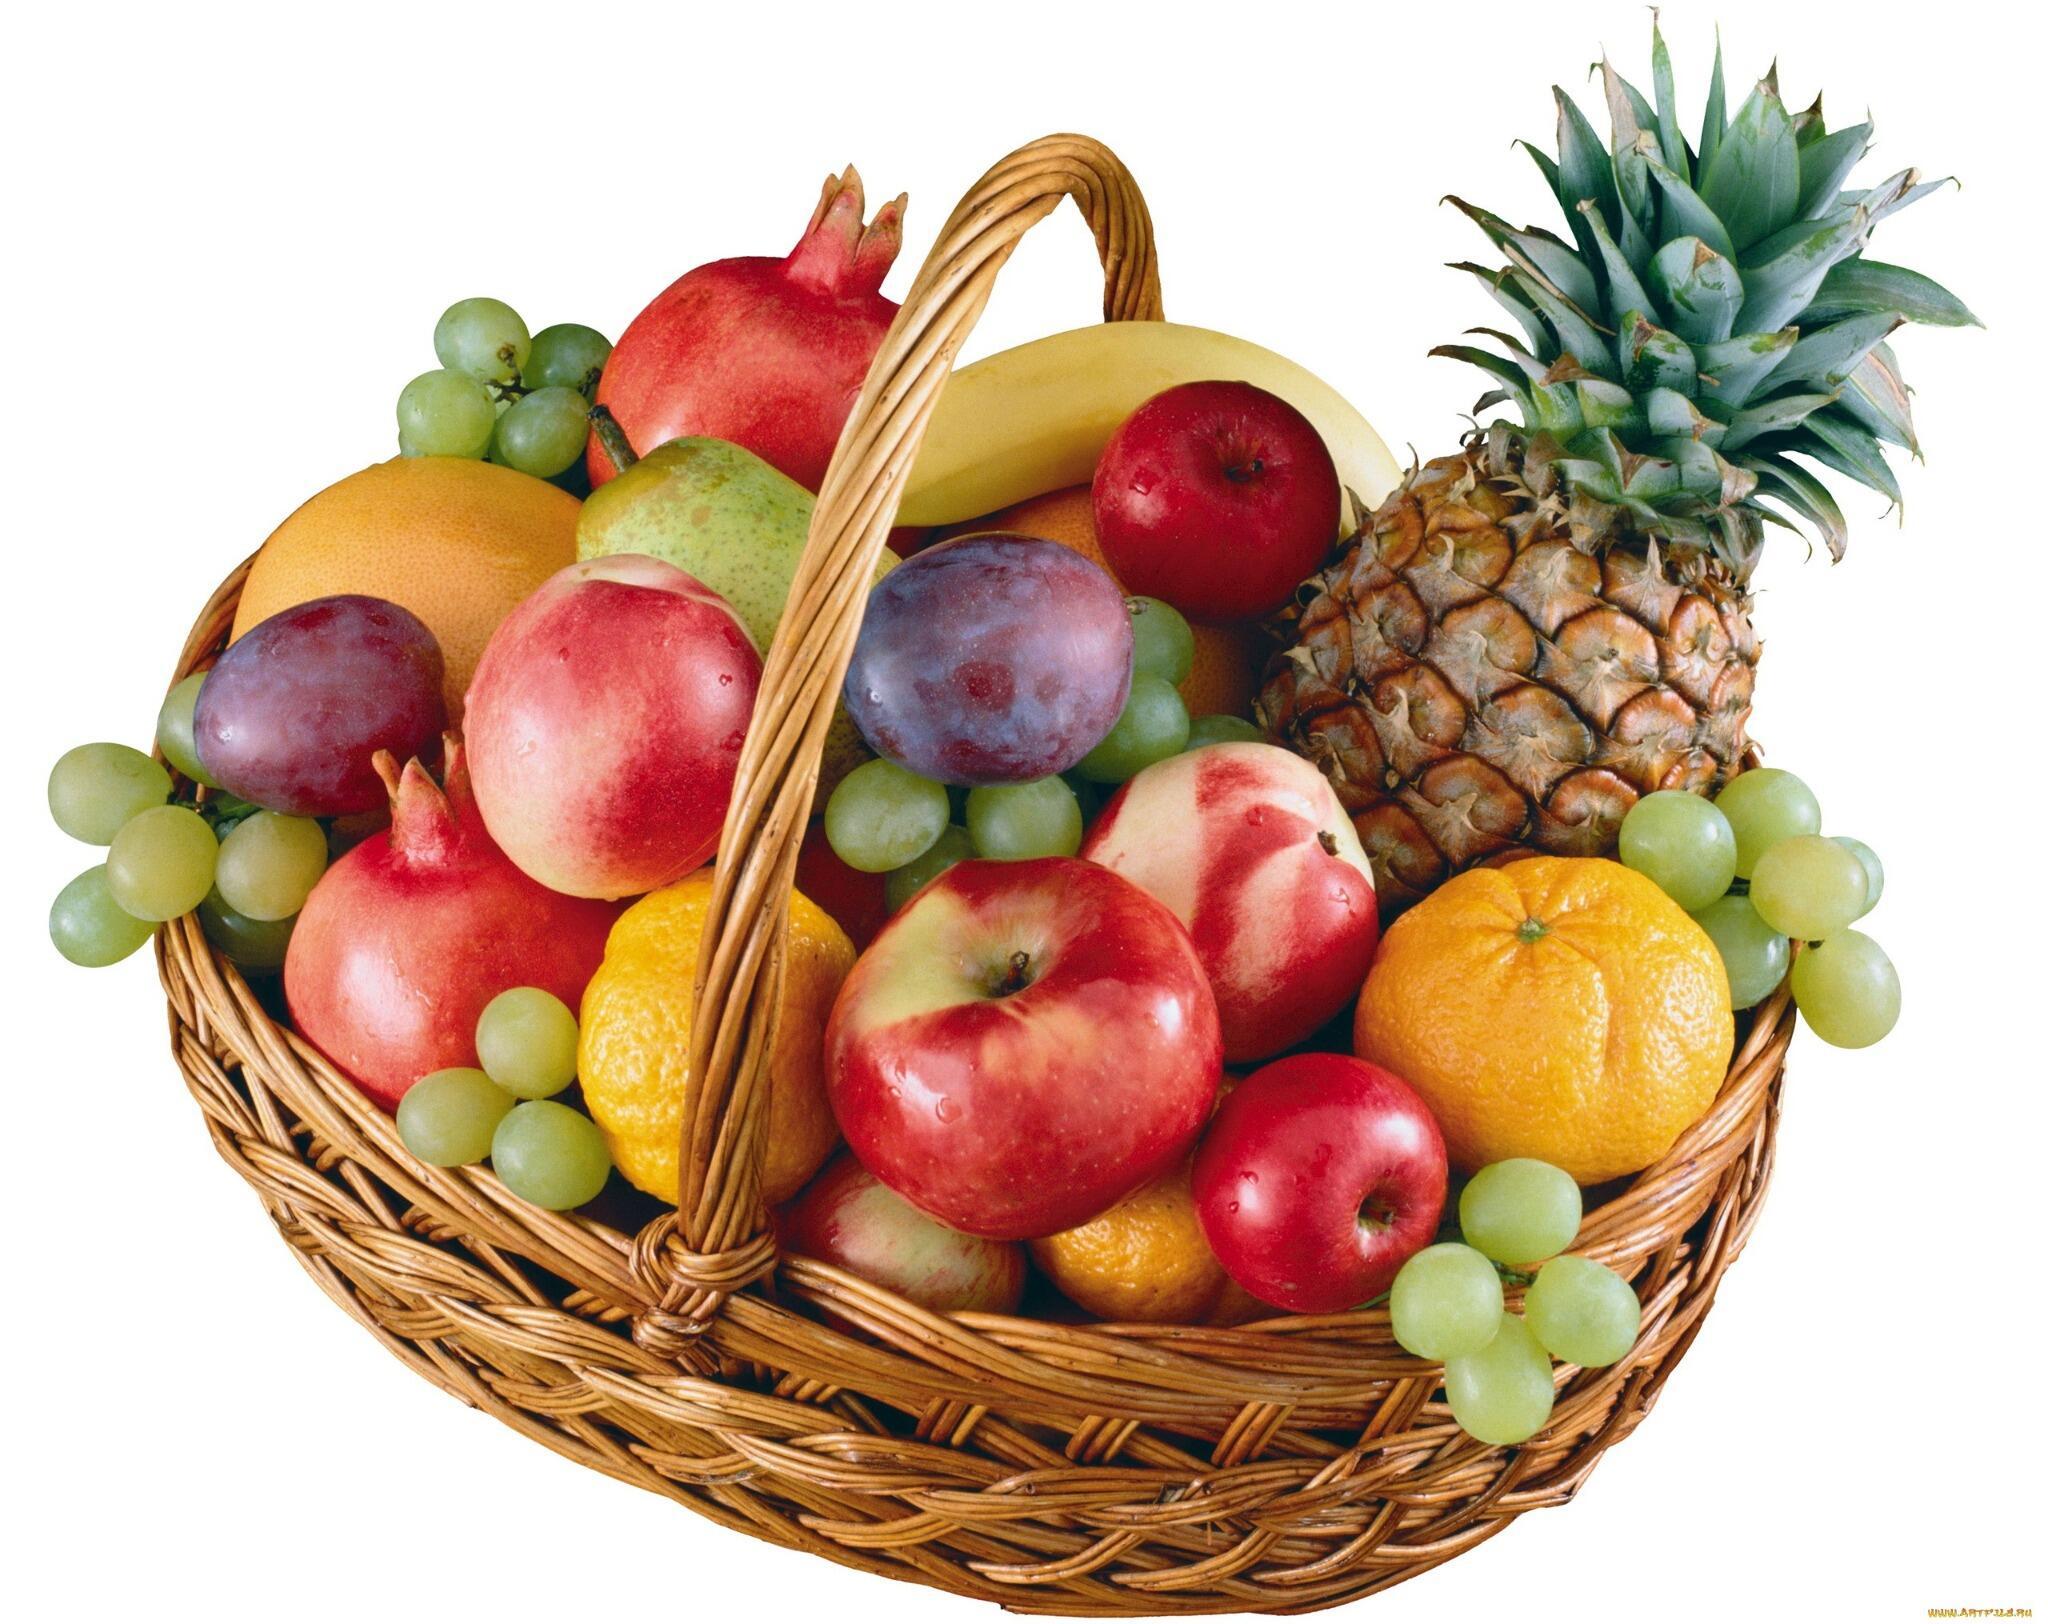 День, картинка корзинка с фруктами